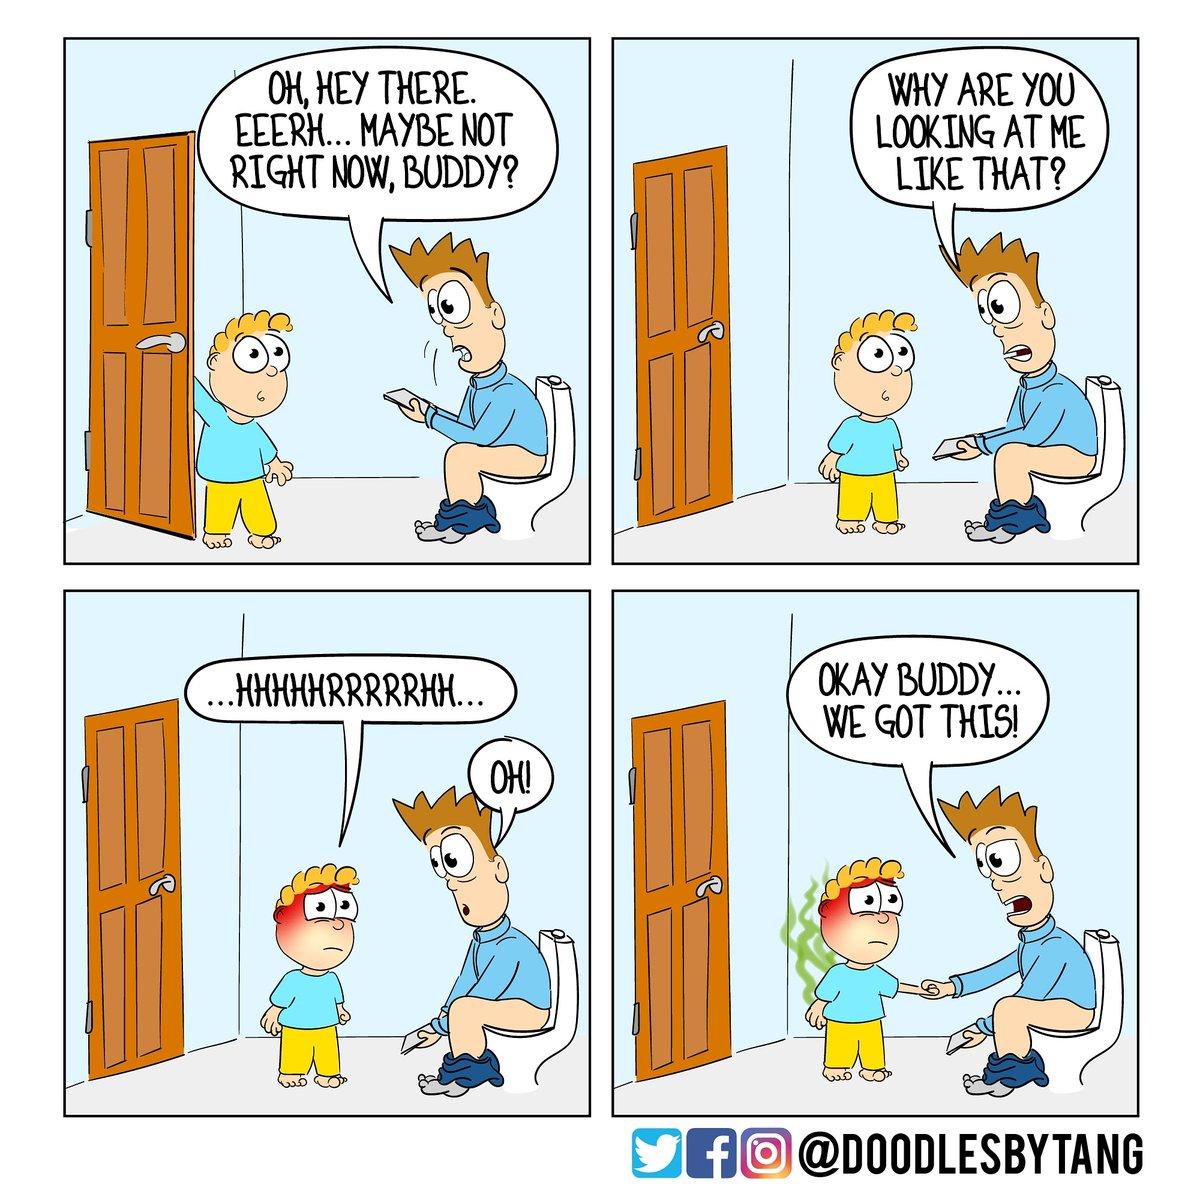 #toilethumor #parenting #dadjokes #dadlife #toddler #dad #parenting #family #familylife #familyfun #webcomic #webtoon #comicstrip #comicart #digitaldrawing #drawing #digitalartist #digitalart  #fun #funny #ilovecomics  #comicpage